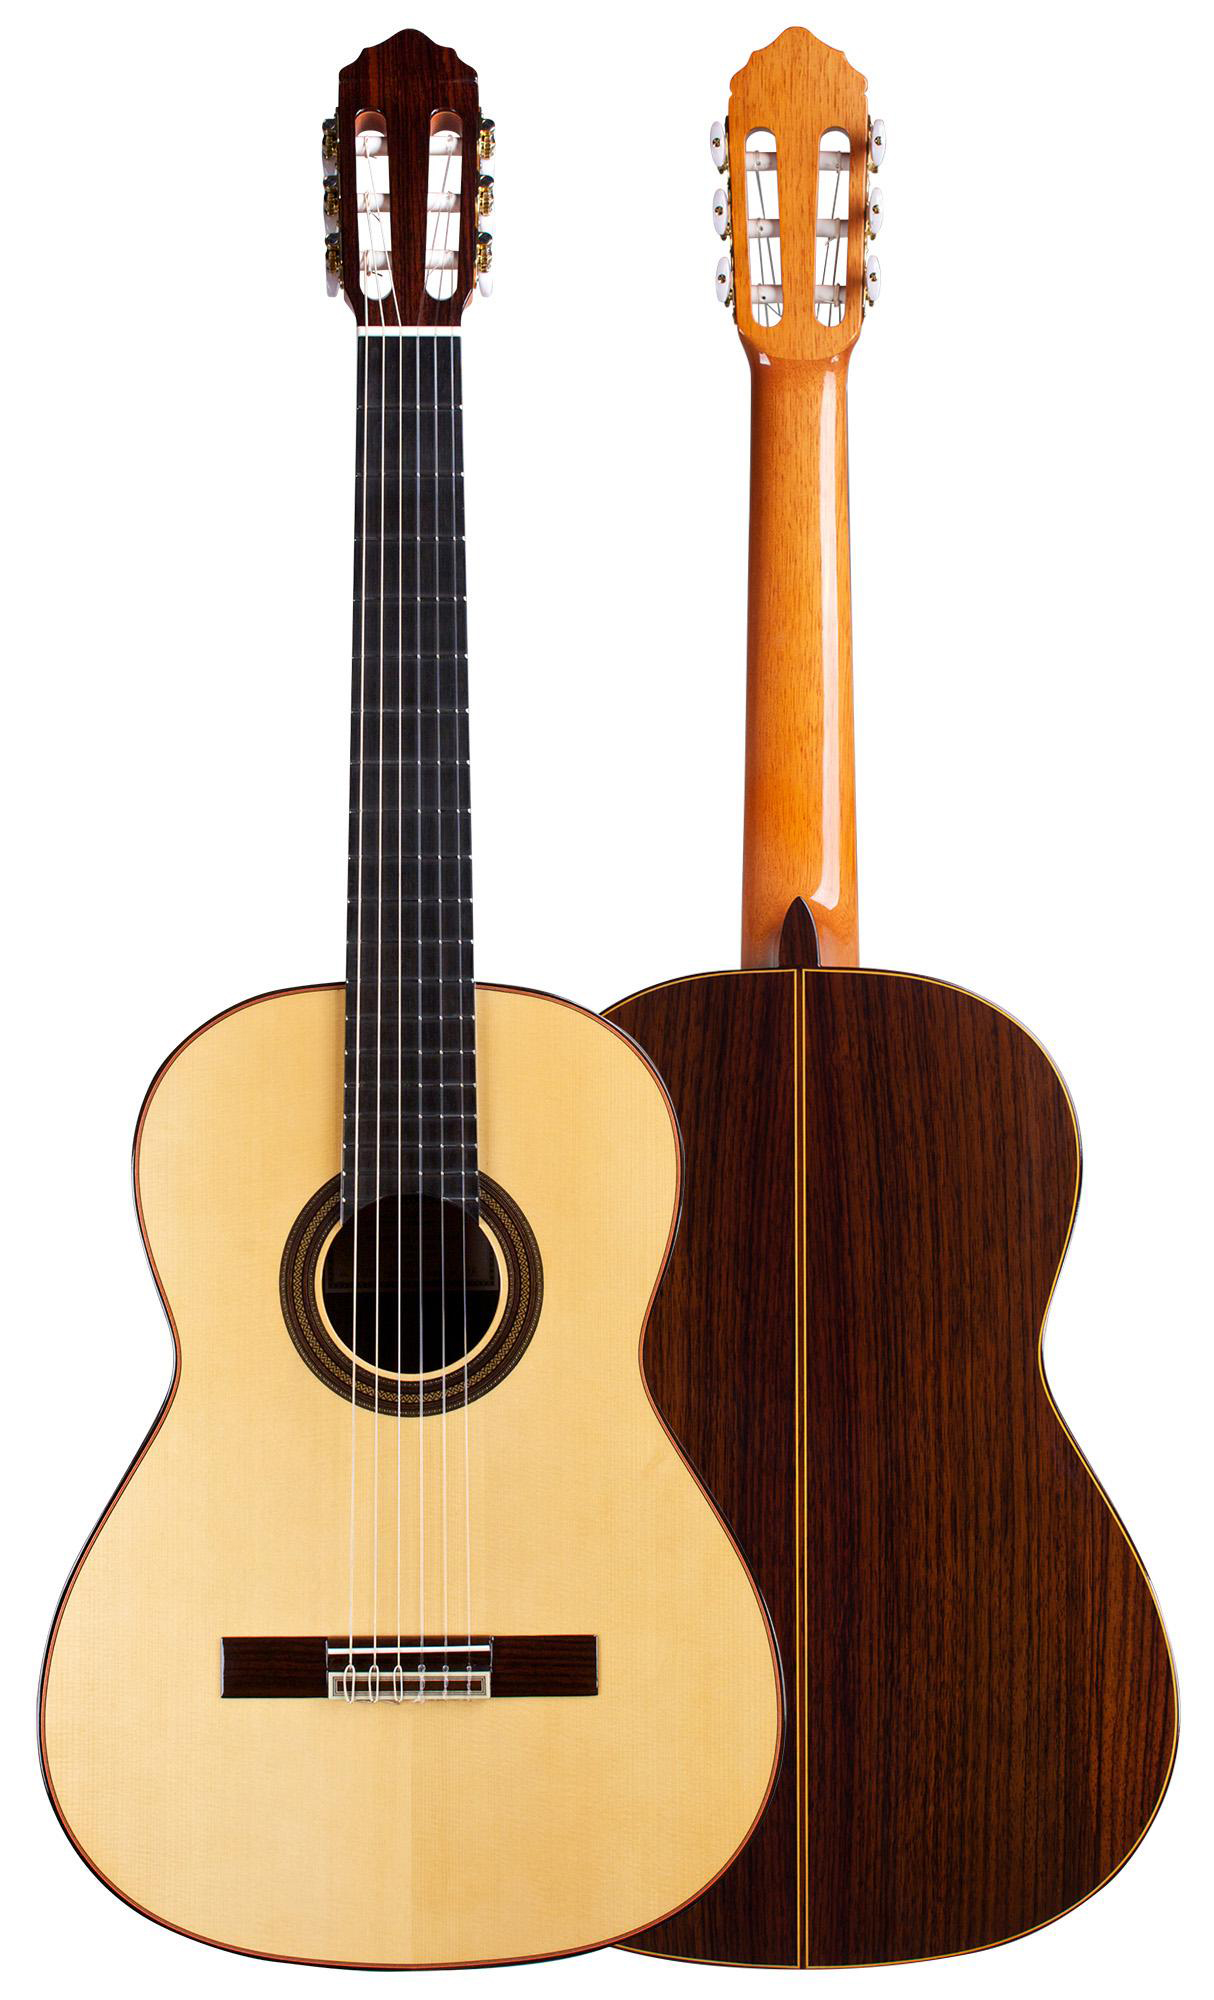 Teodoro Perez (Madrid) - Modell Estudio-650 - spruce top, case included.